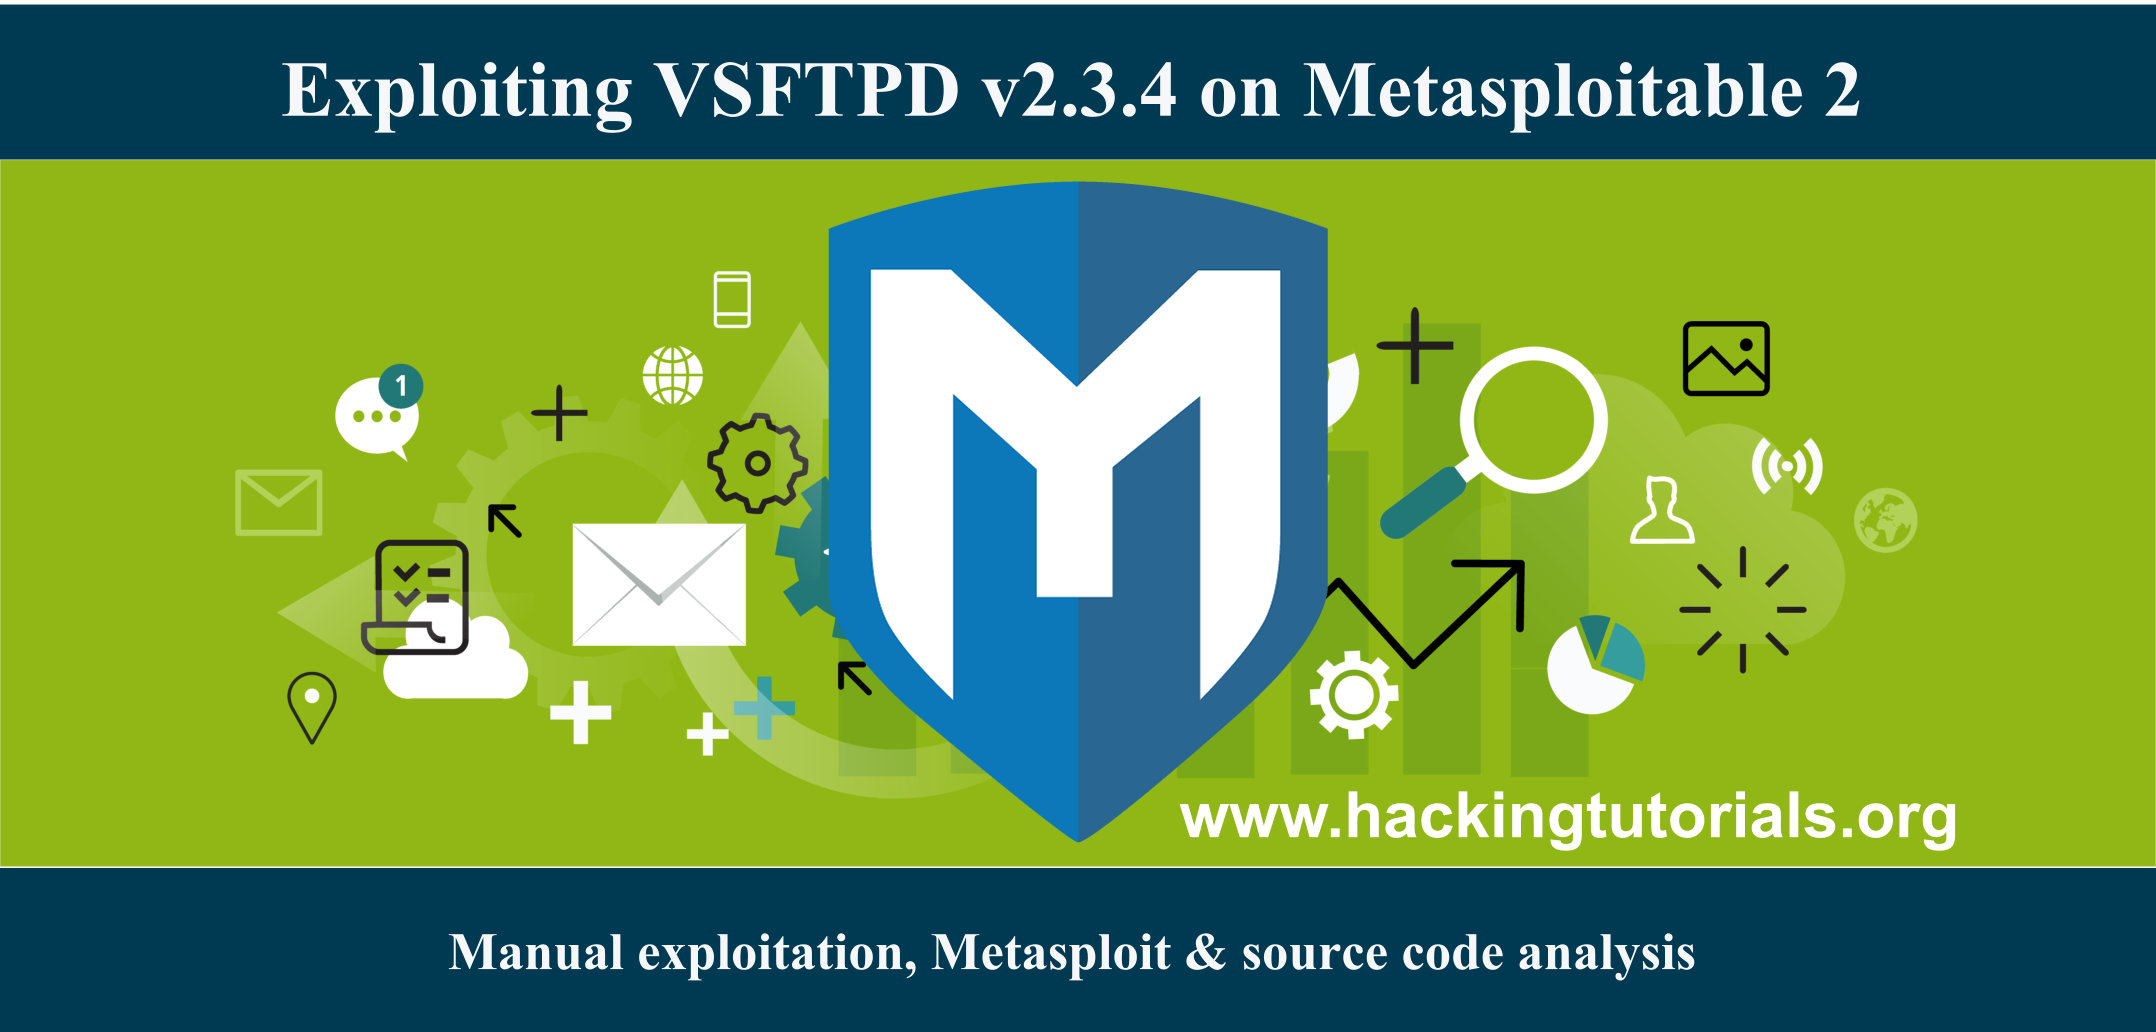 Exploiting VSFTPD v2 3 4 on Metasploitable 2 - Hacking Tutorials